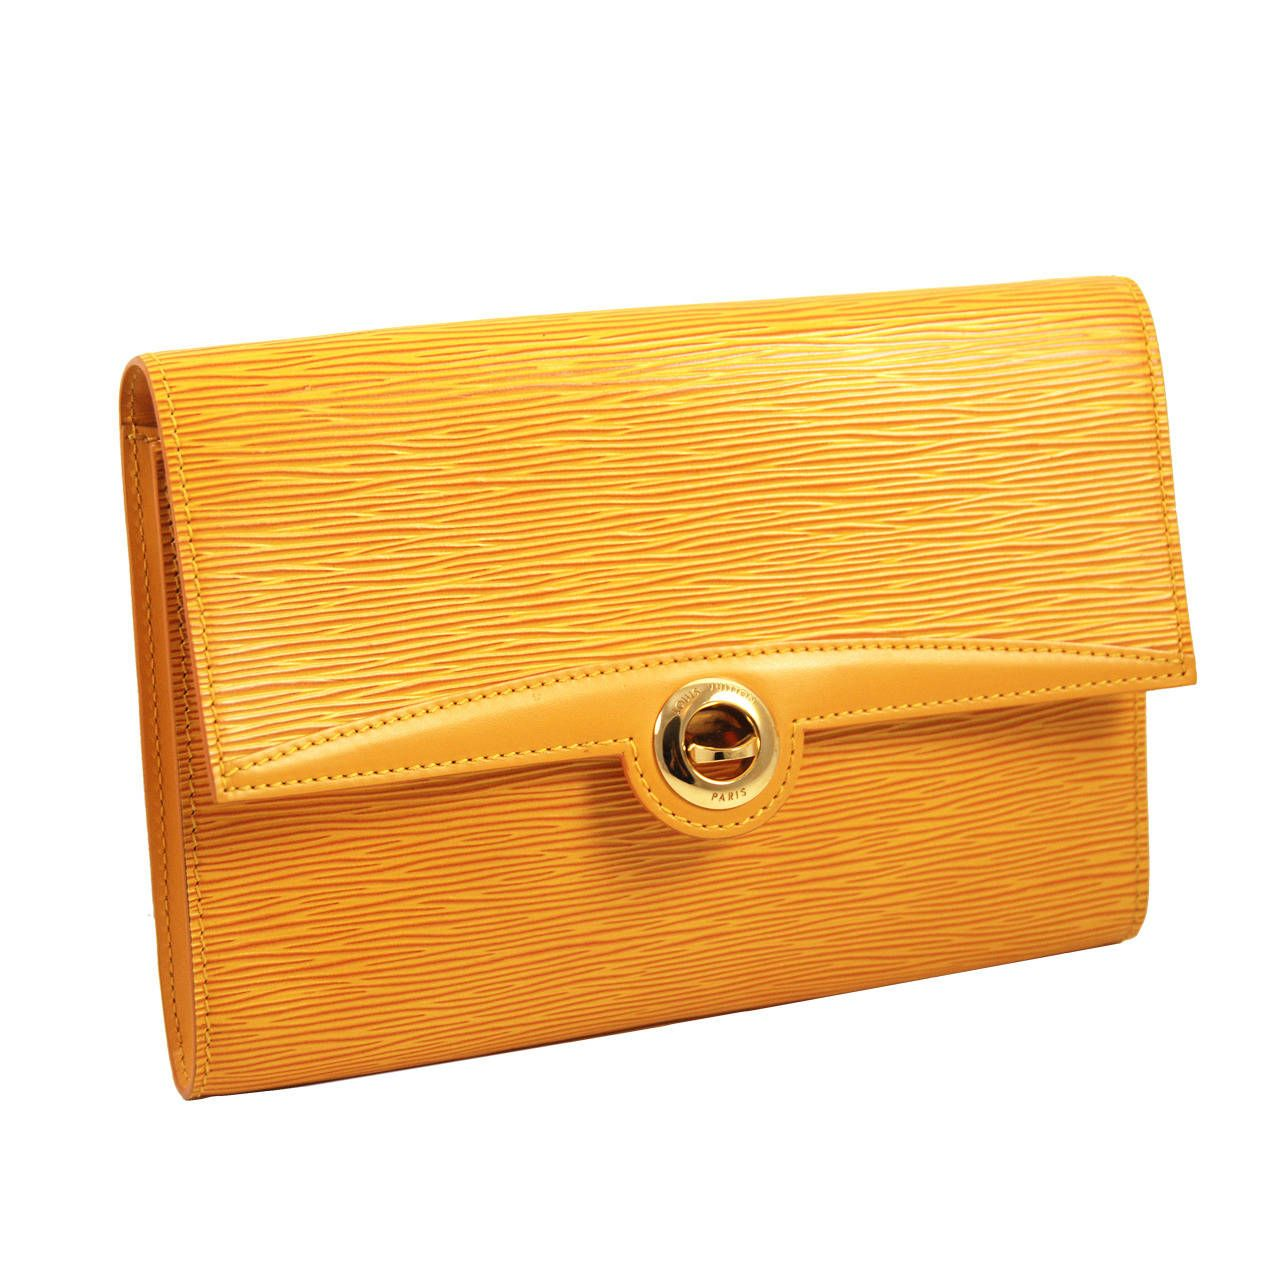 c490cd826247 Louis Vuitton Mustard Yellow Epi Leather Arche Clutch